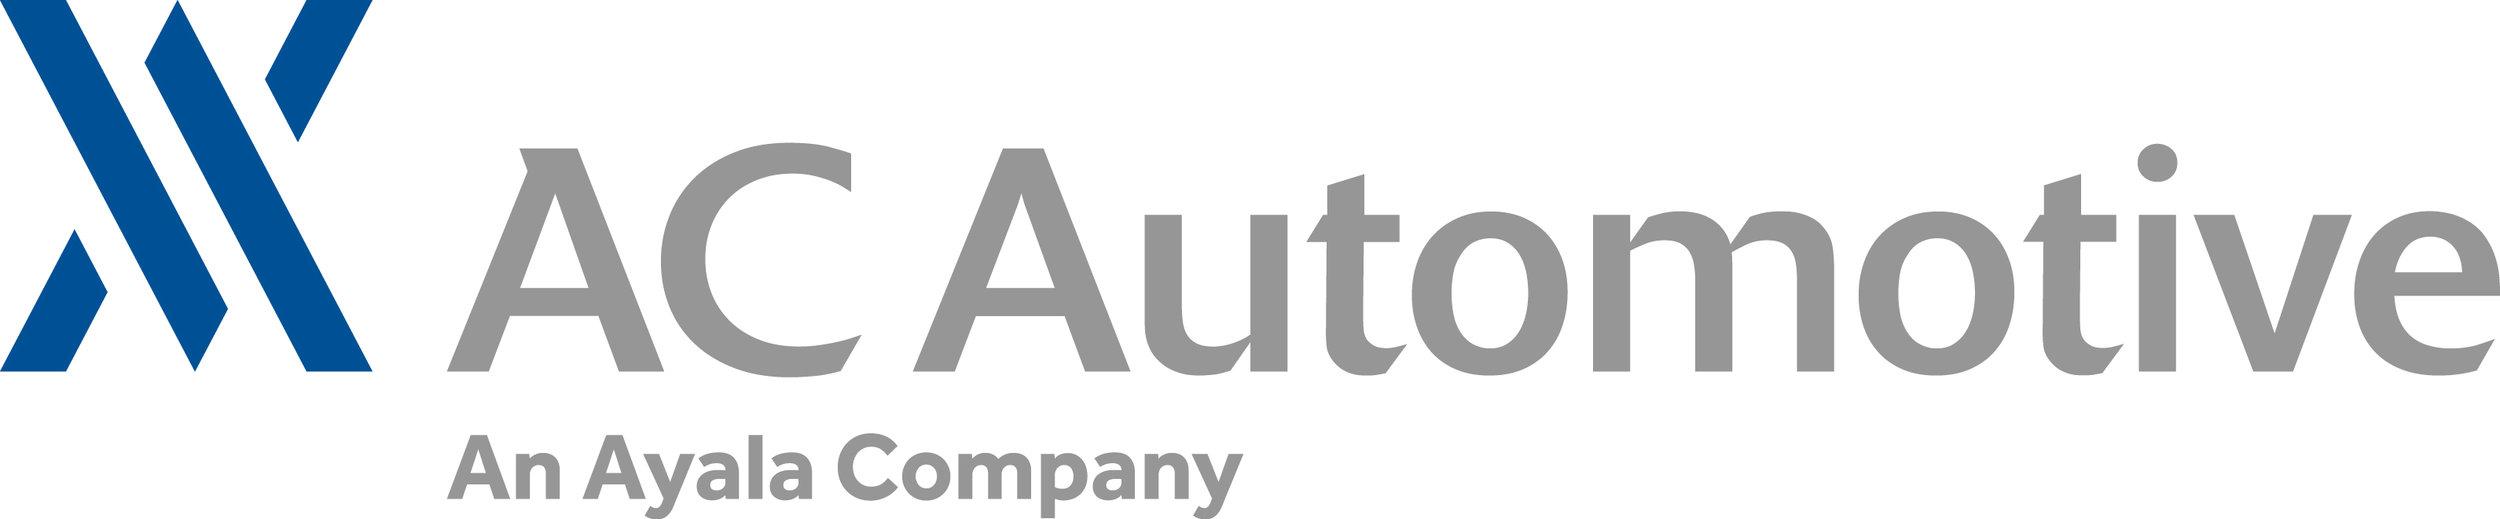 AC Automotive Logo (Ayala Company).jpg